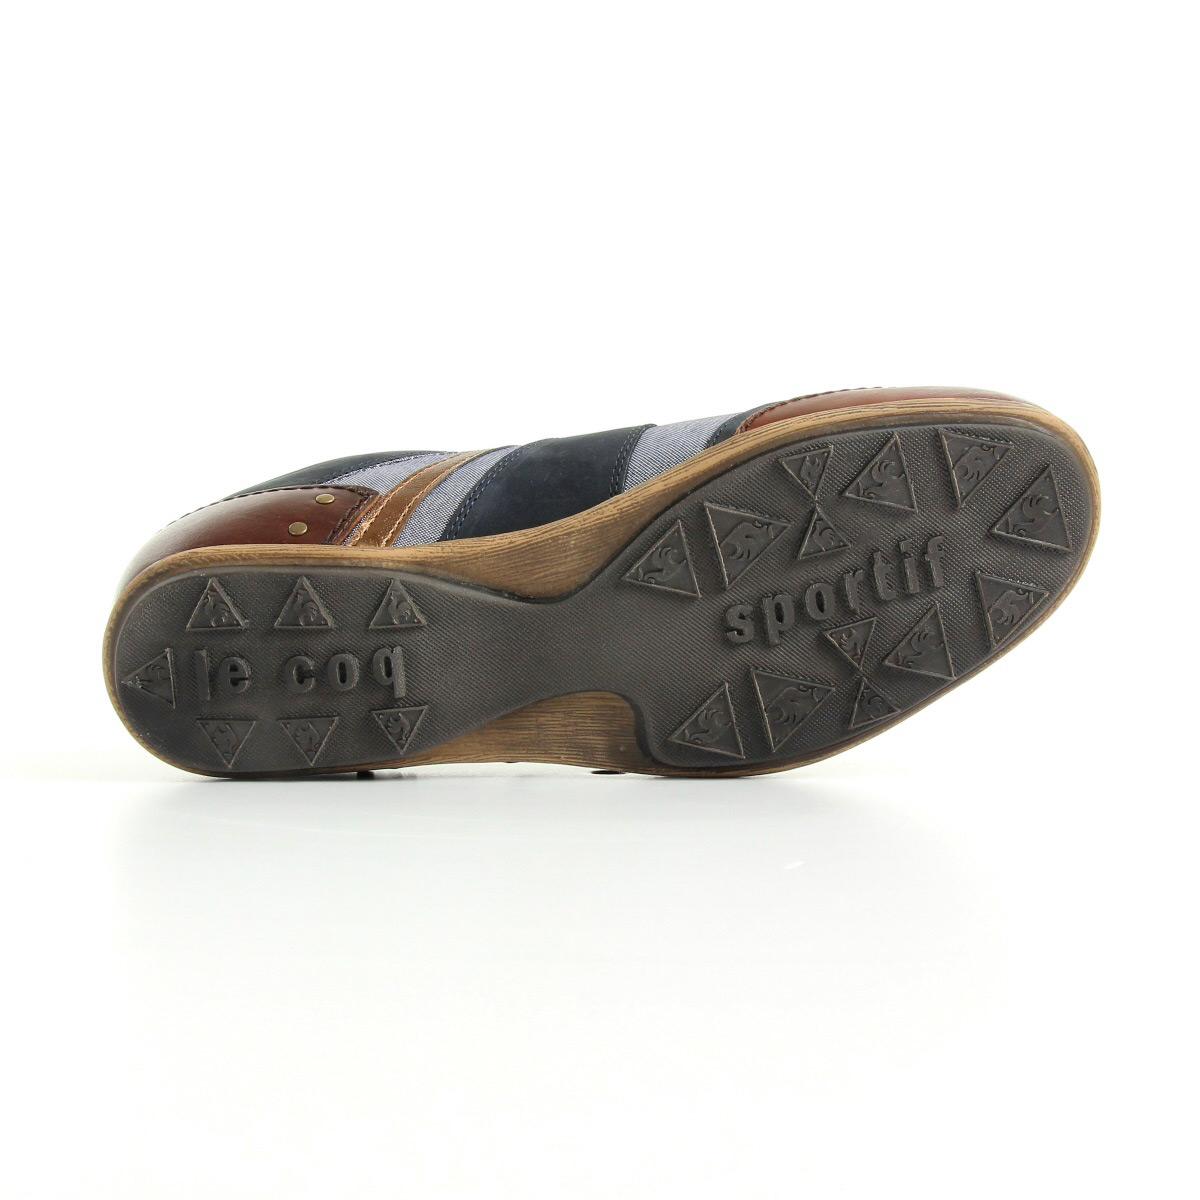 sneaker schuhe le coq sportif herren turin 2 tones cvs. Black Bedroom Furniture Sets. Home Design Ideas